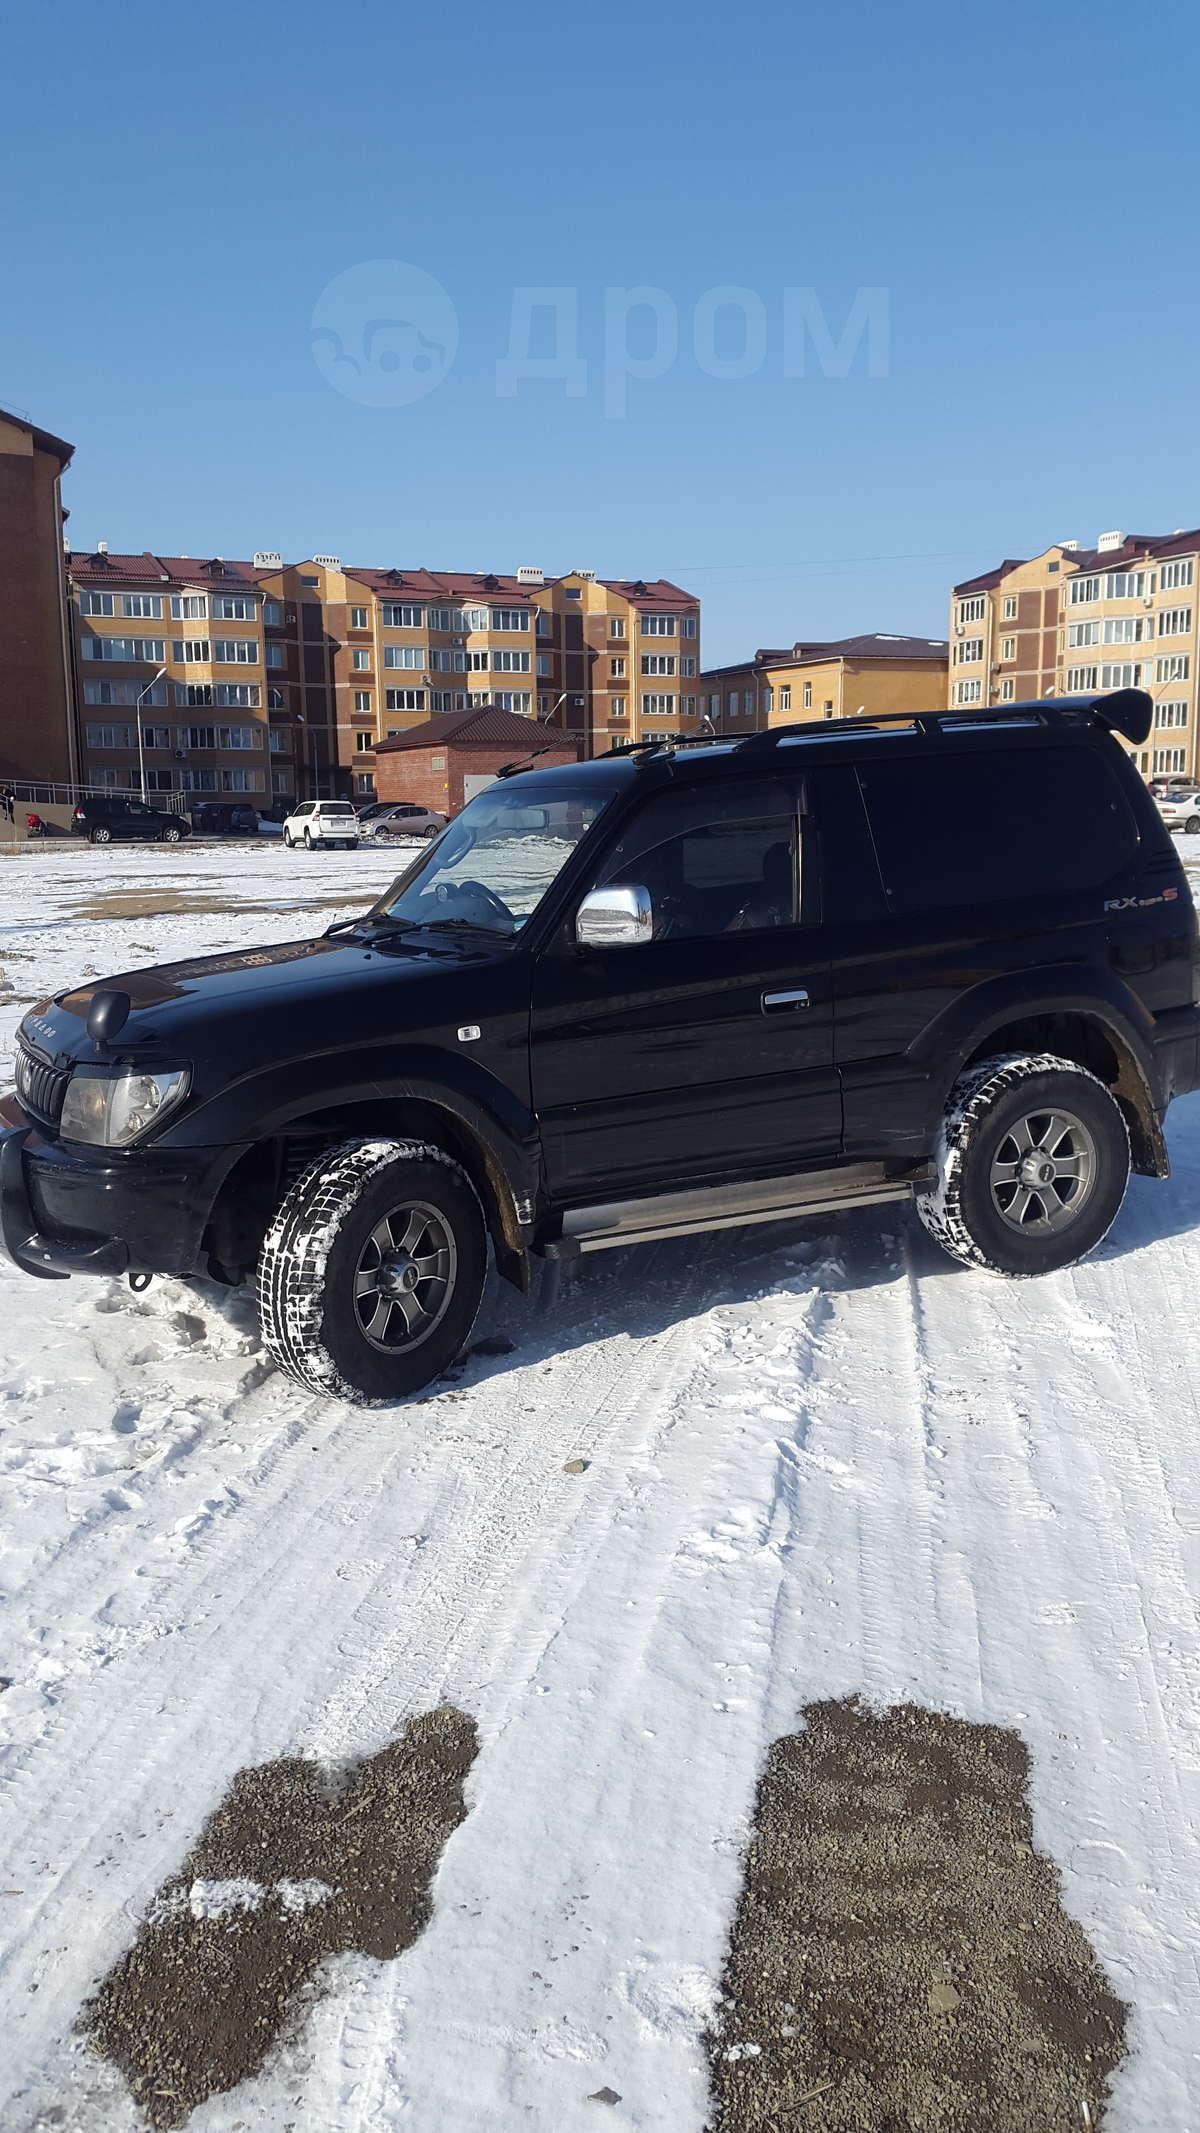 Toyota Land Cruiser Prado 150 2.8 дизель - ciklotto.ru